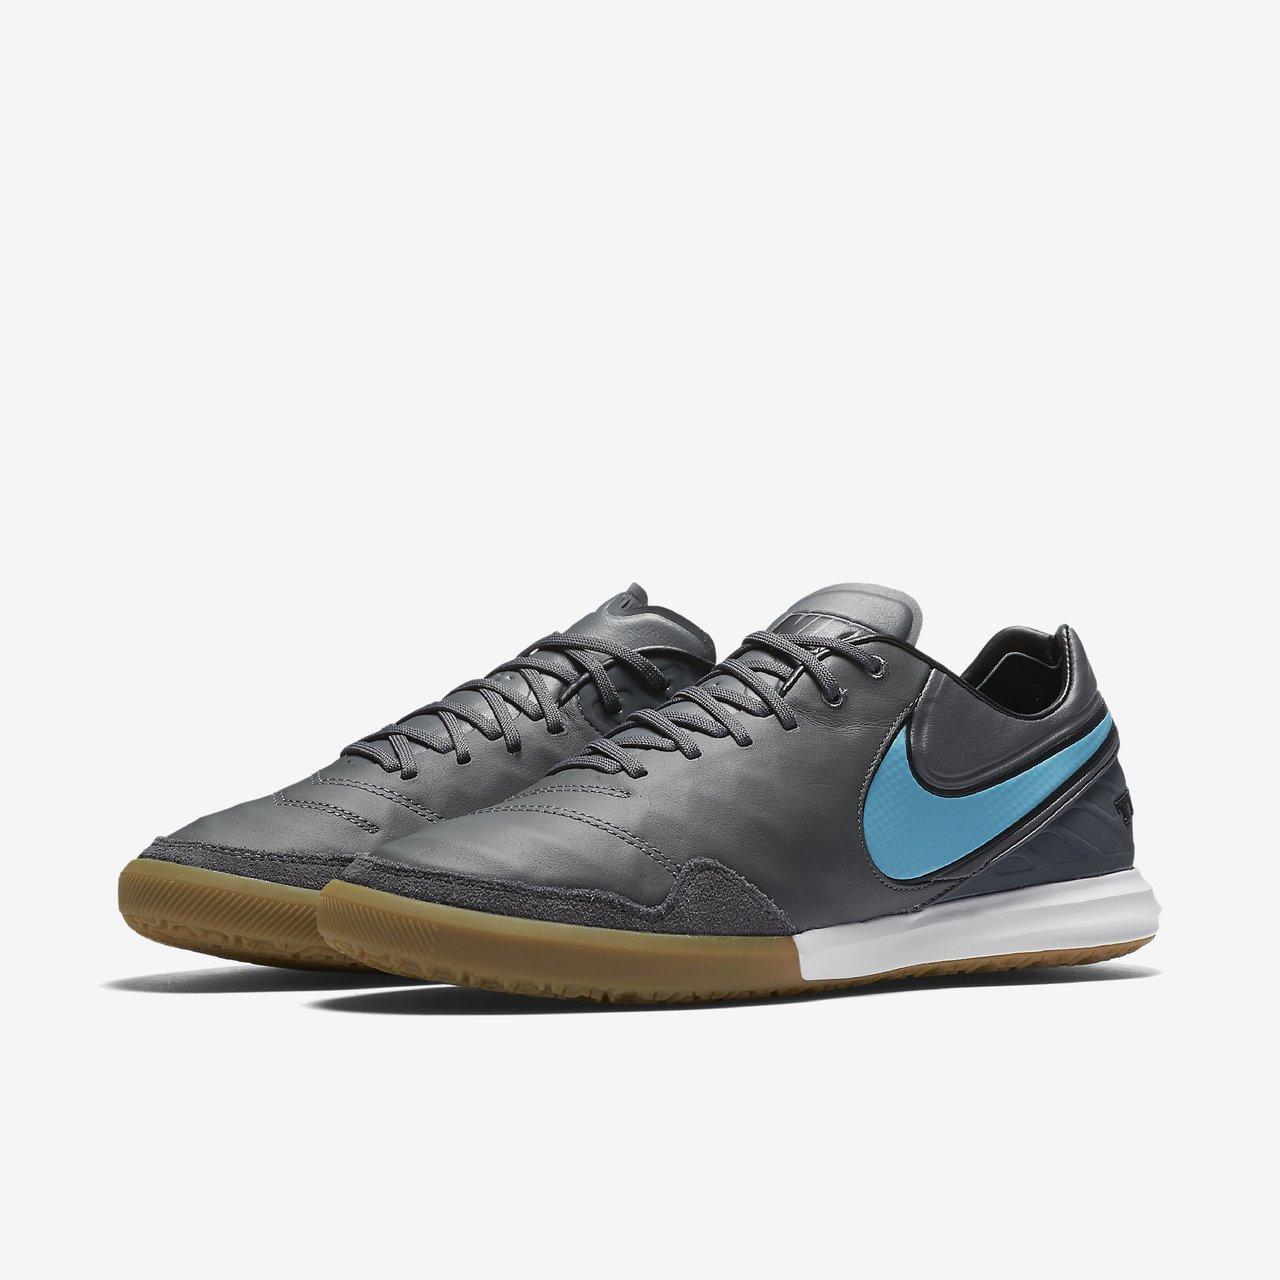 b76831faab21 Nike TiempoX Proximo IC - Dark Grey / Gum Light Brown / White / Polarised  Blue